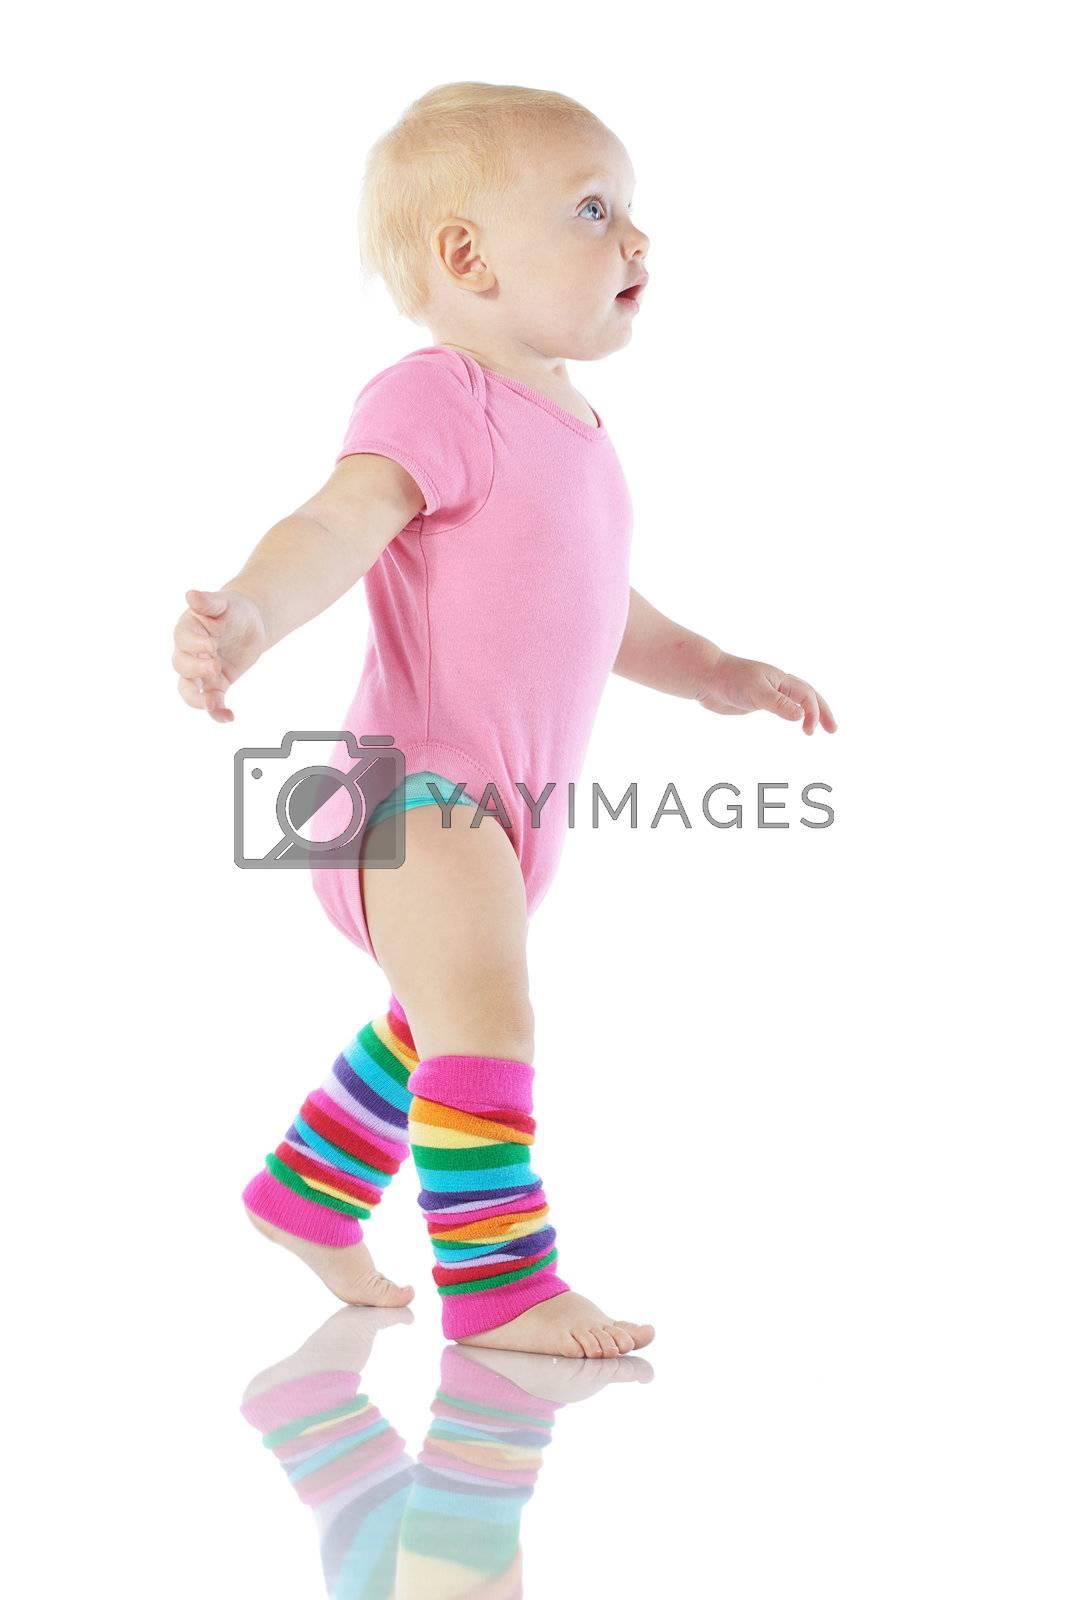 Toddler by alenkasm